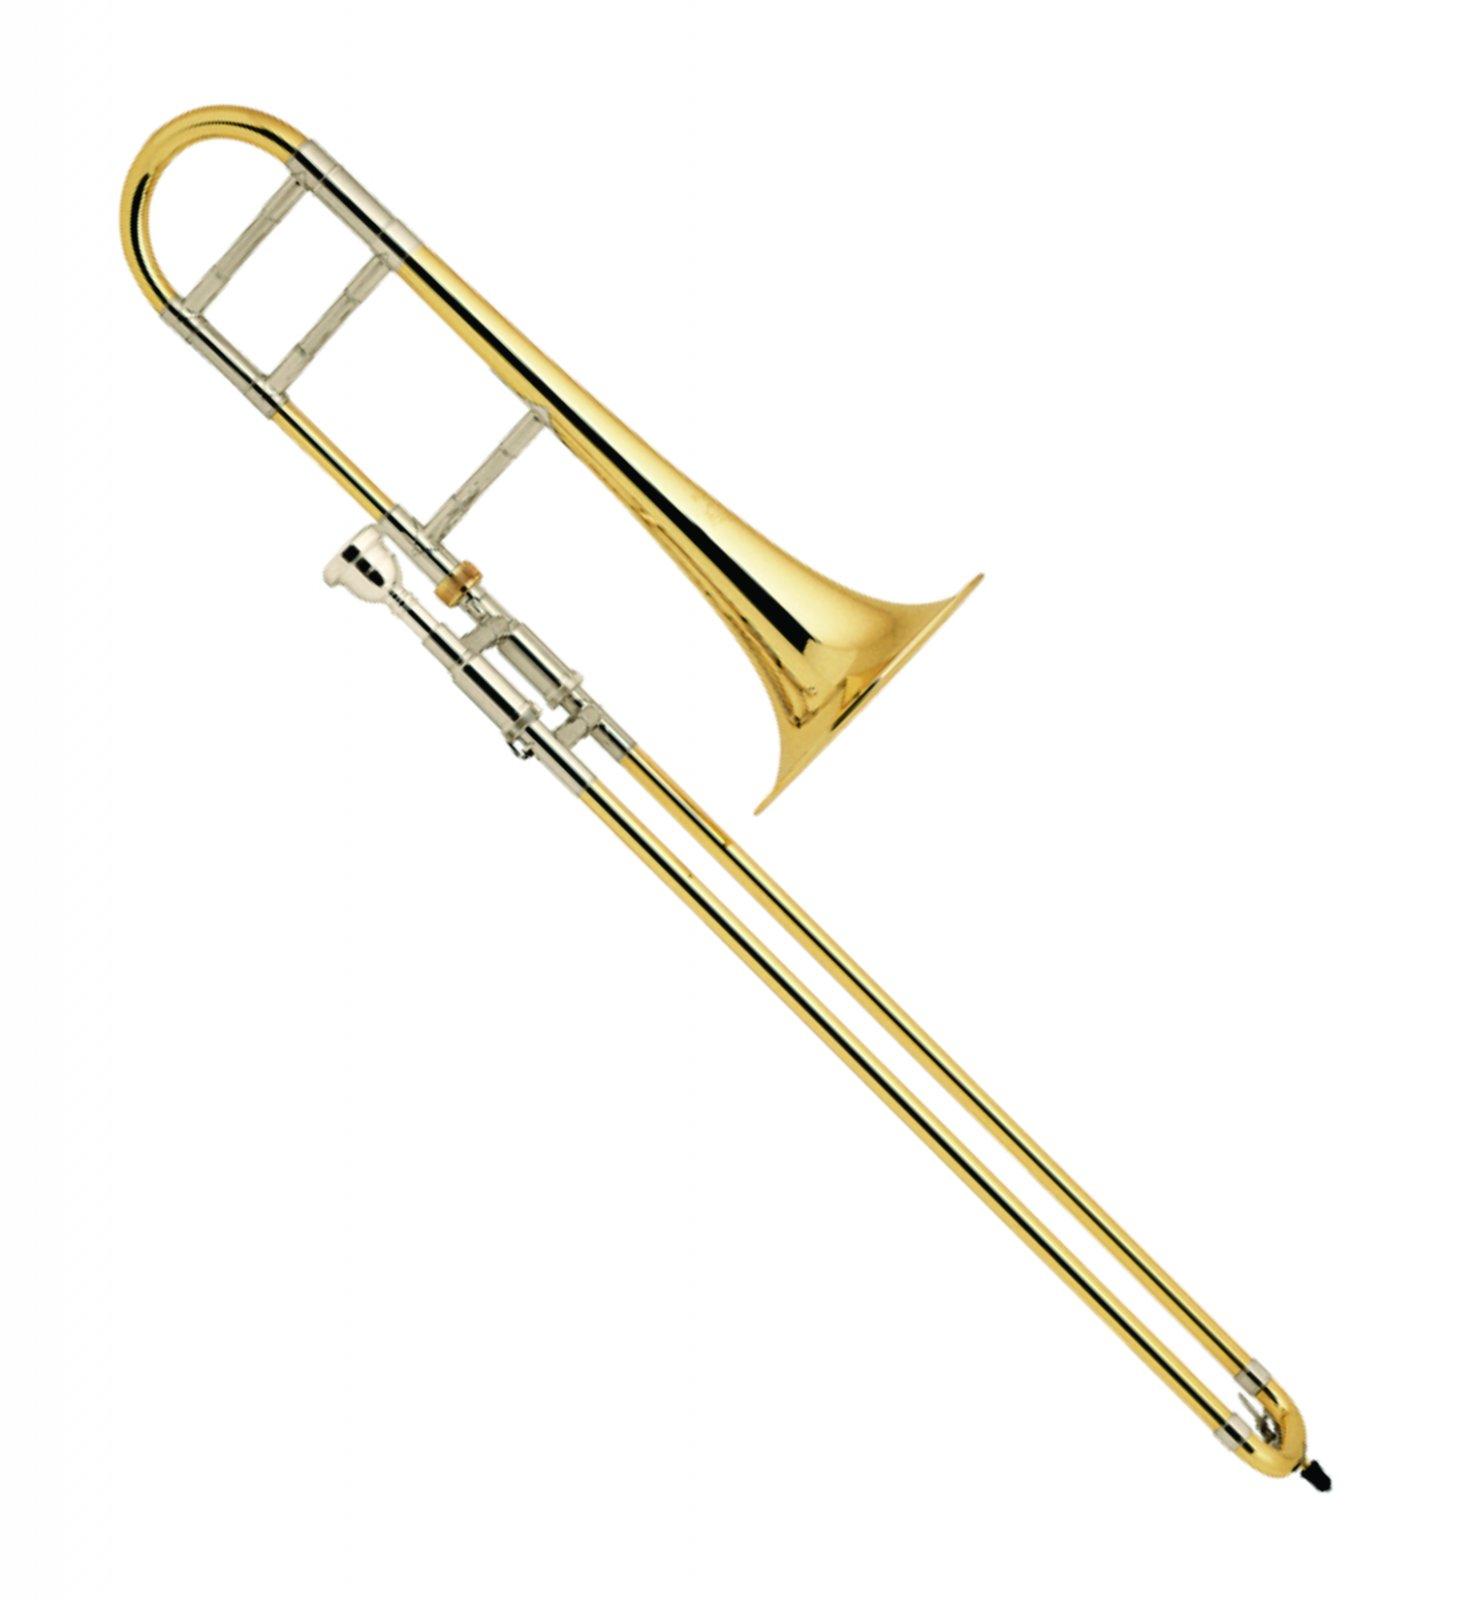 BACH 39 Professional Alto Trombone